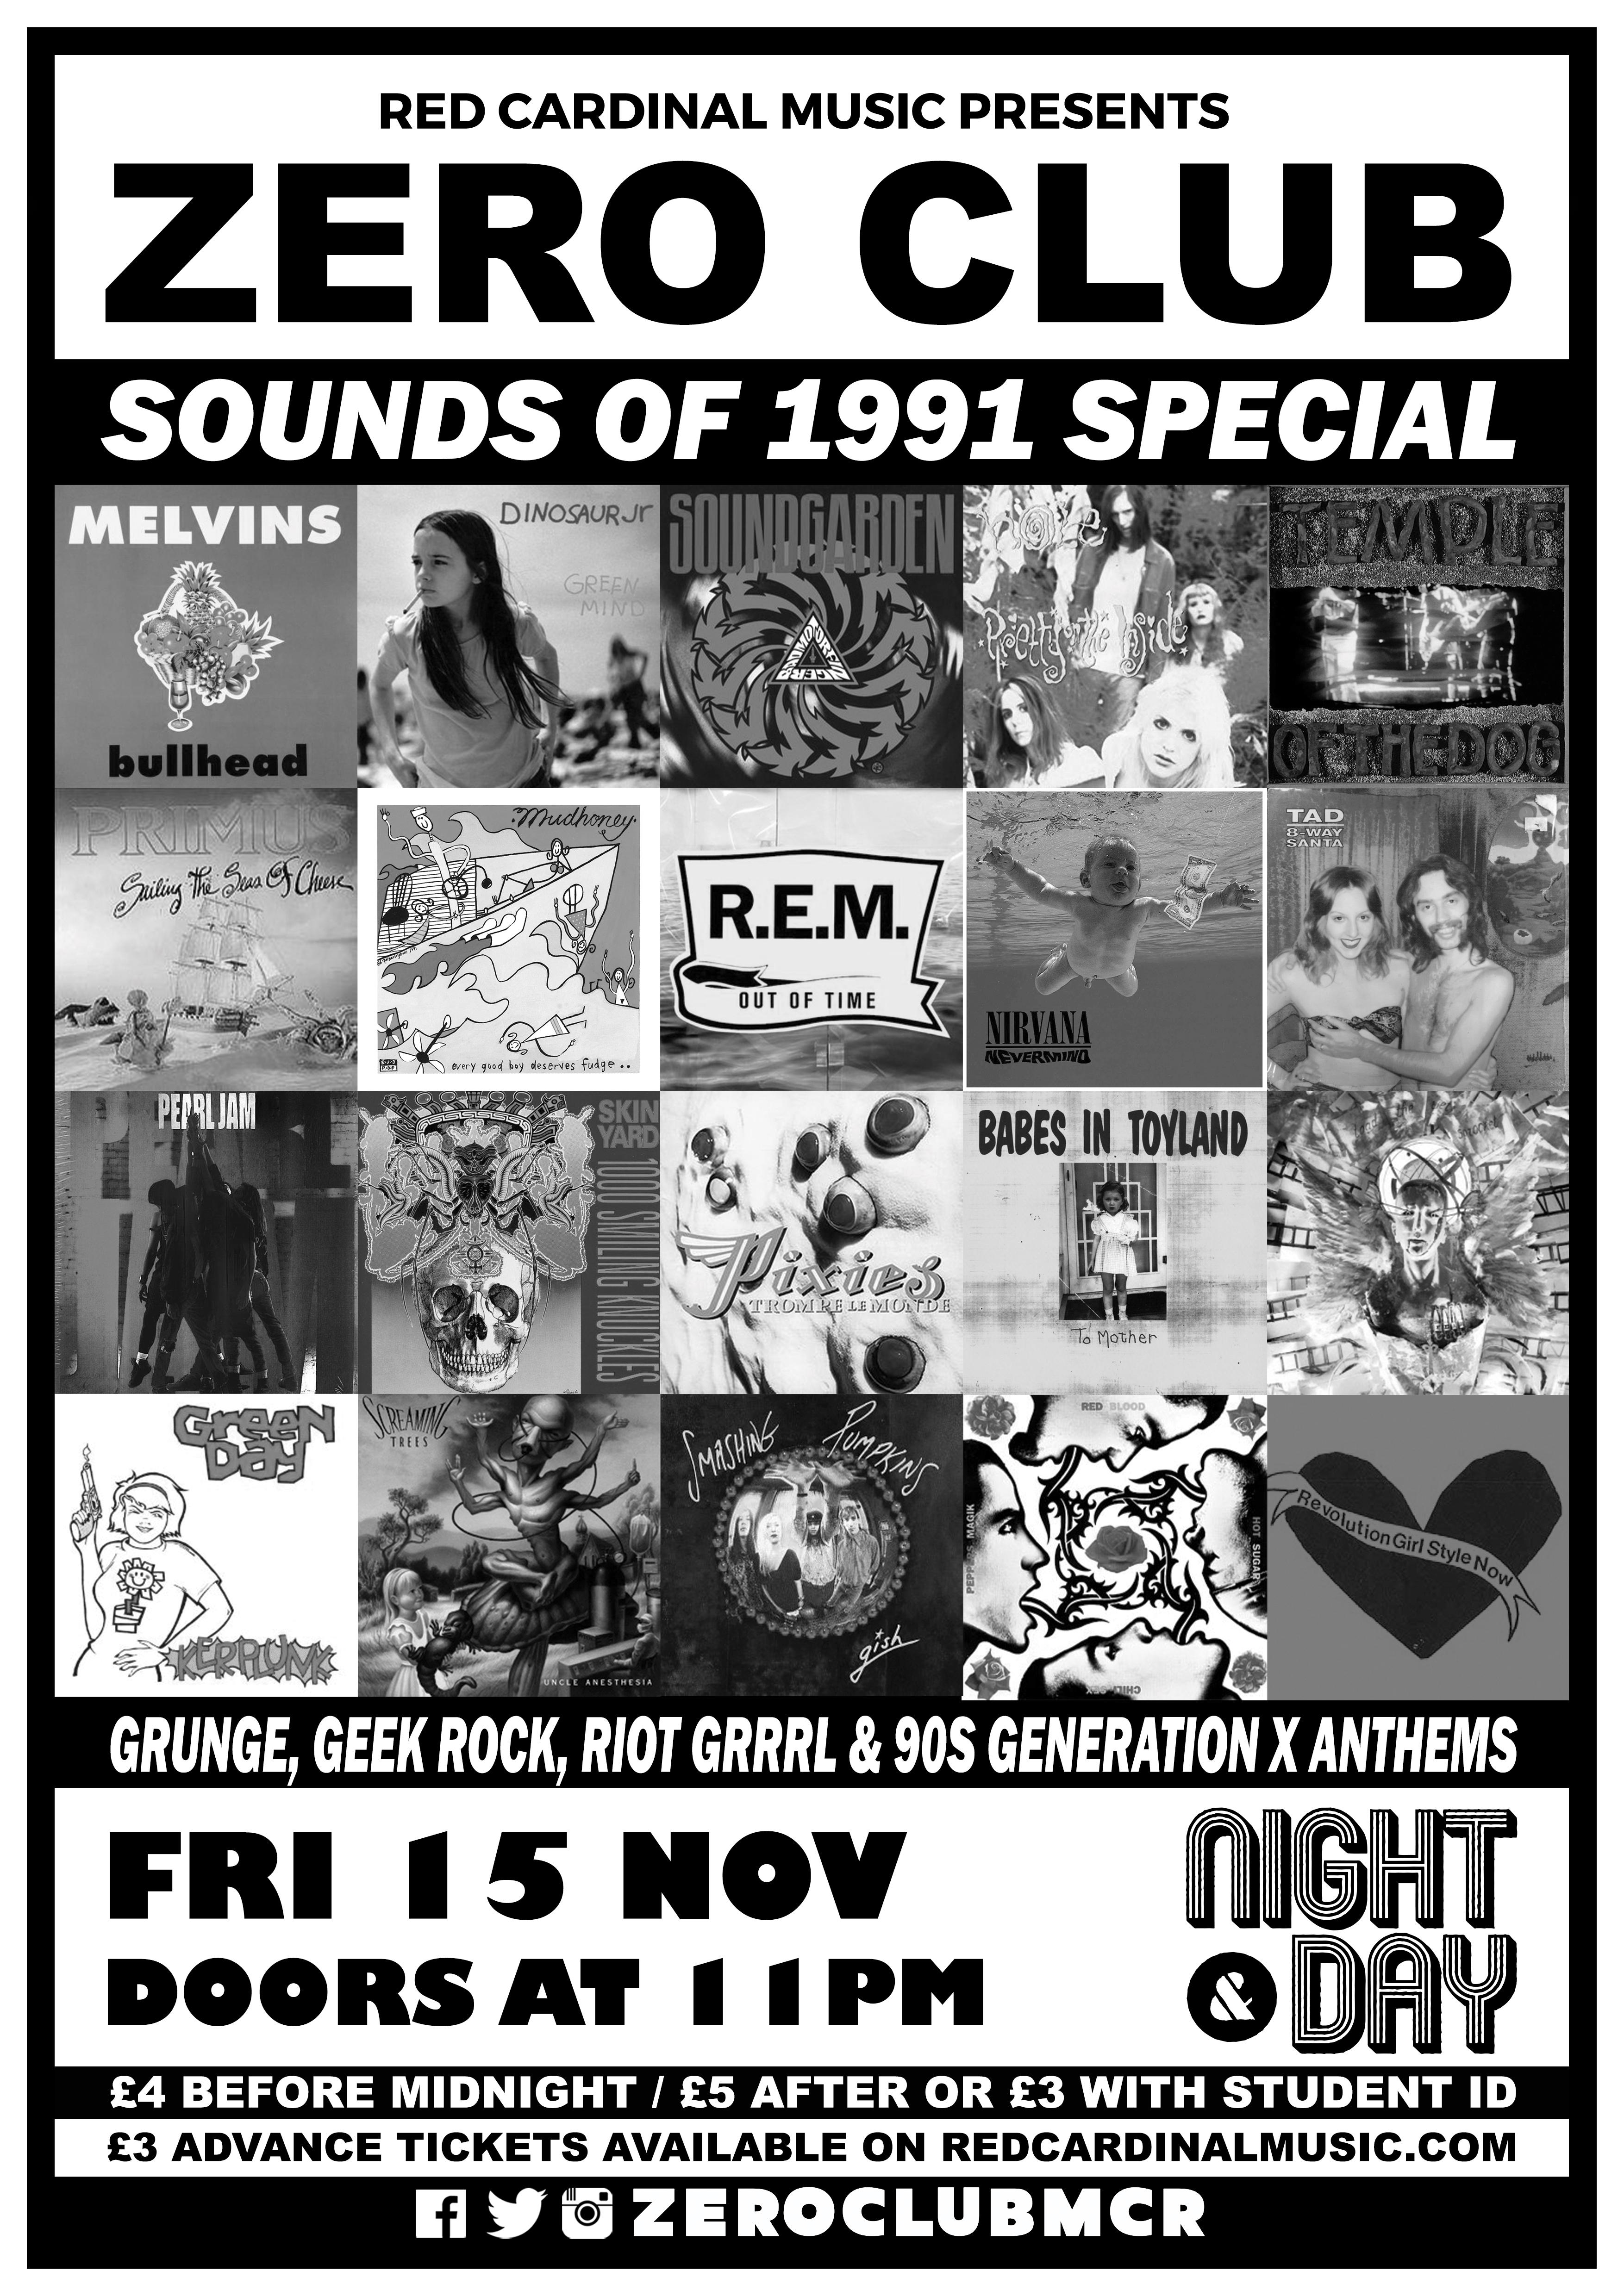 Zero Club - Nov 19 - Sounds of 1991 - Grunge, Riot Grrrl, Generation X,  Red Cardinal Music, Manchester